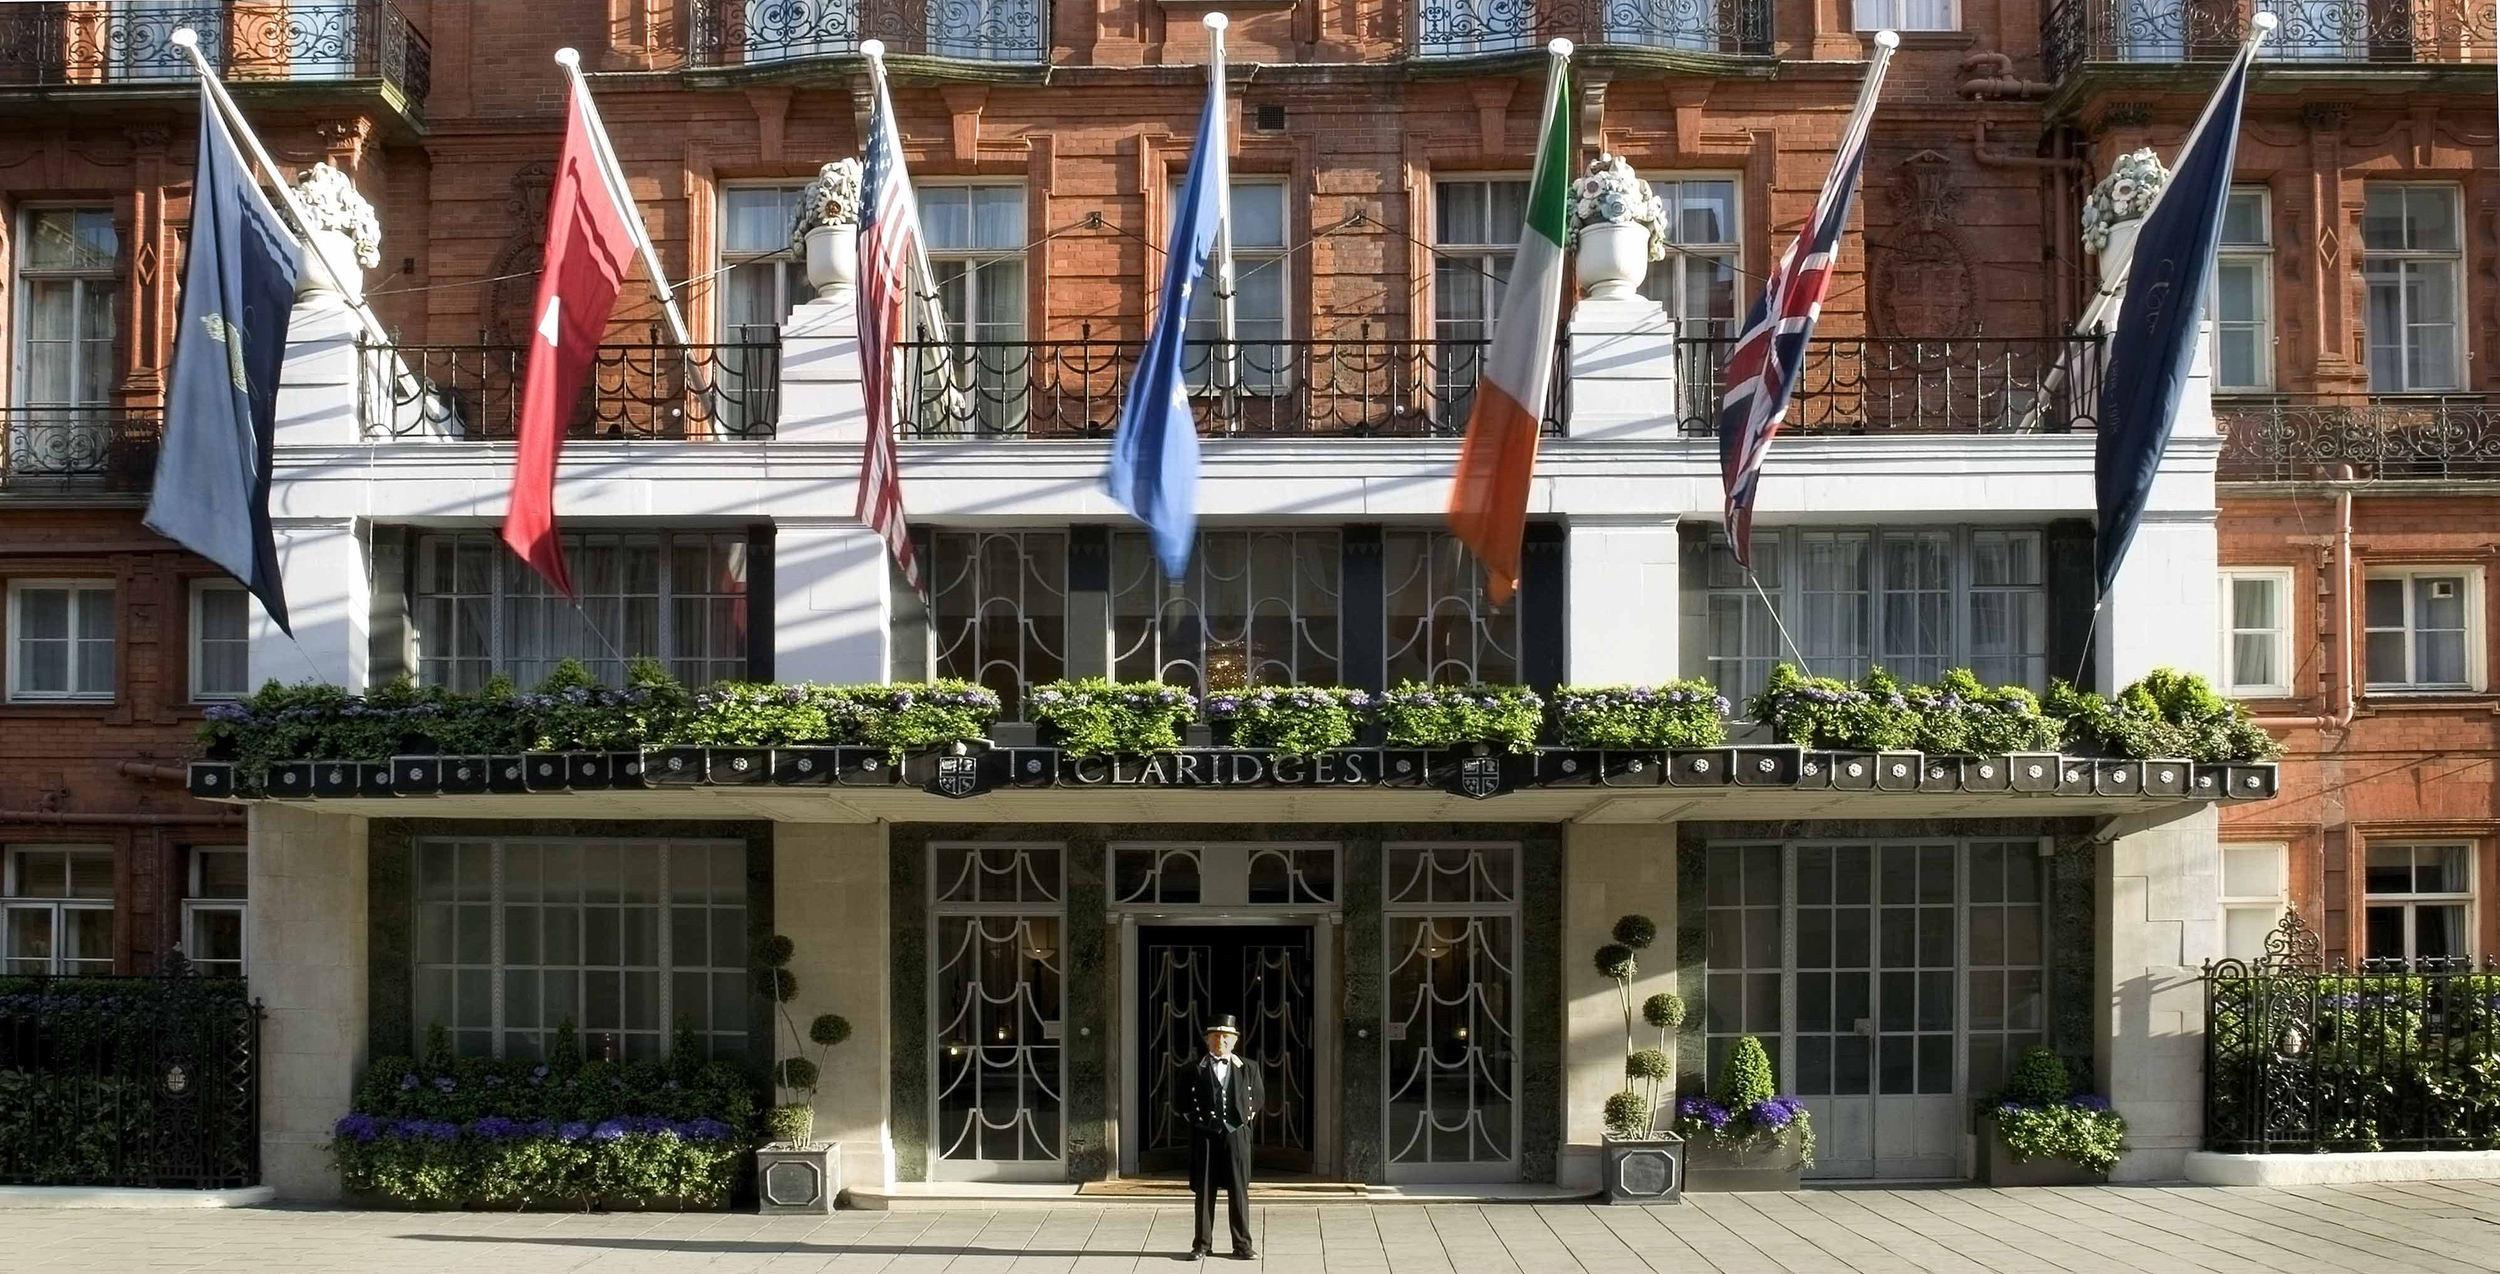 UK-England-London-Claridges-Exterior-Doorman.jpg